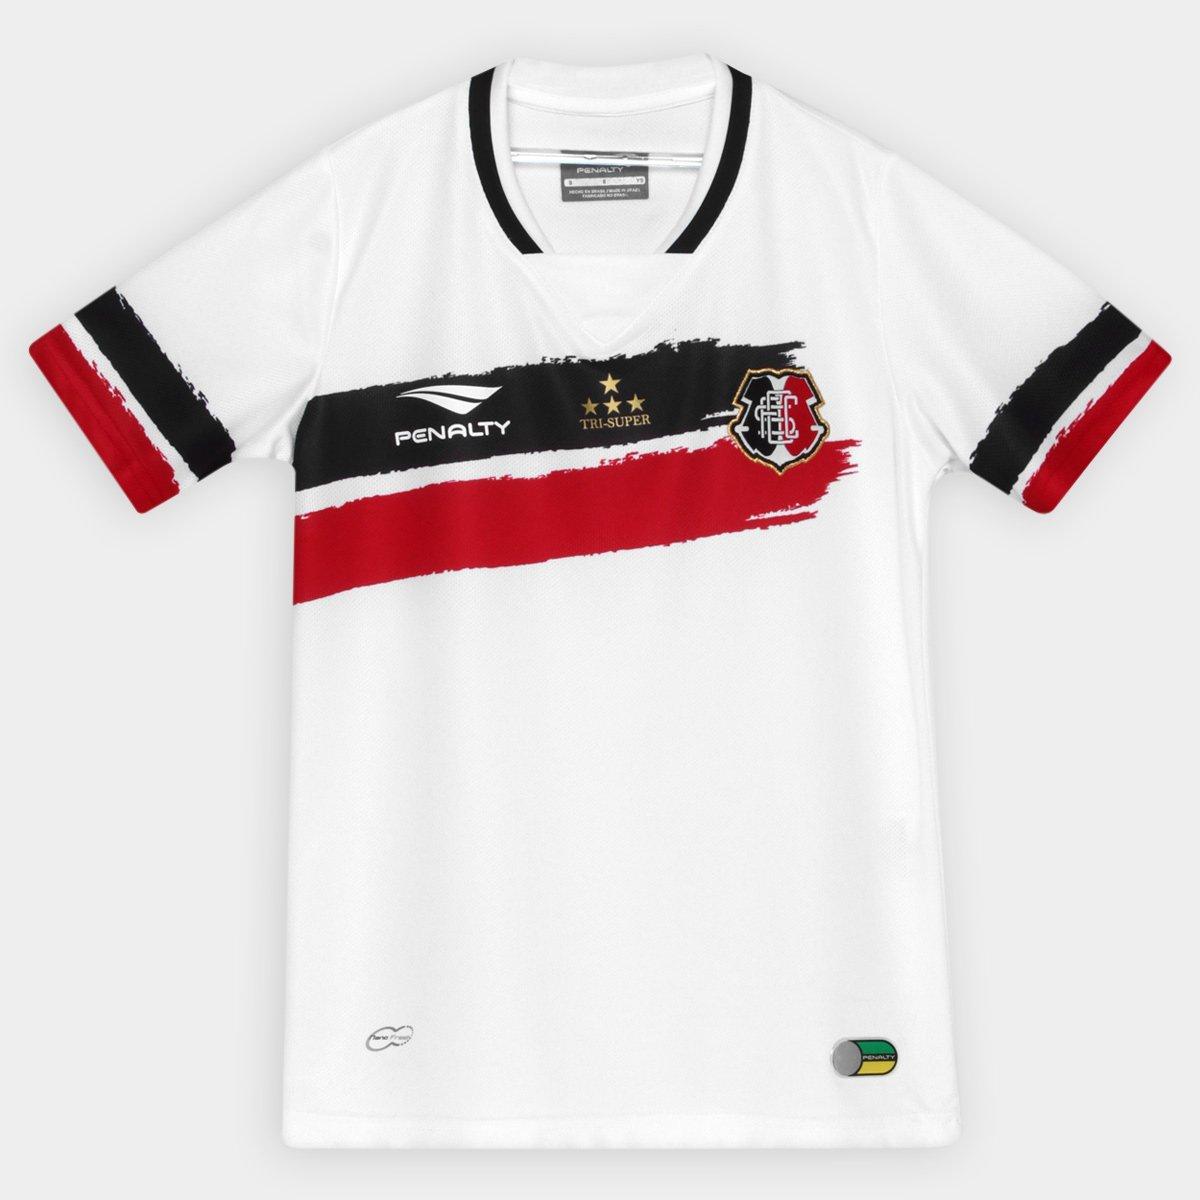 ae19580161 Camisa Santa Cruz Infantil II 2016 s nº Torcedor Penalty - Compre Agora